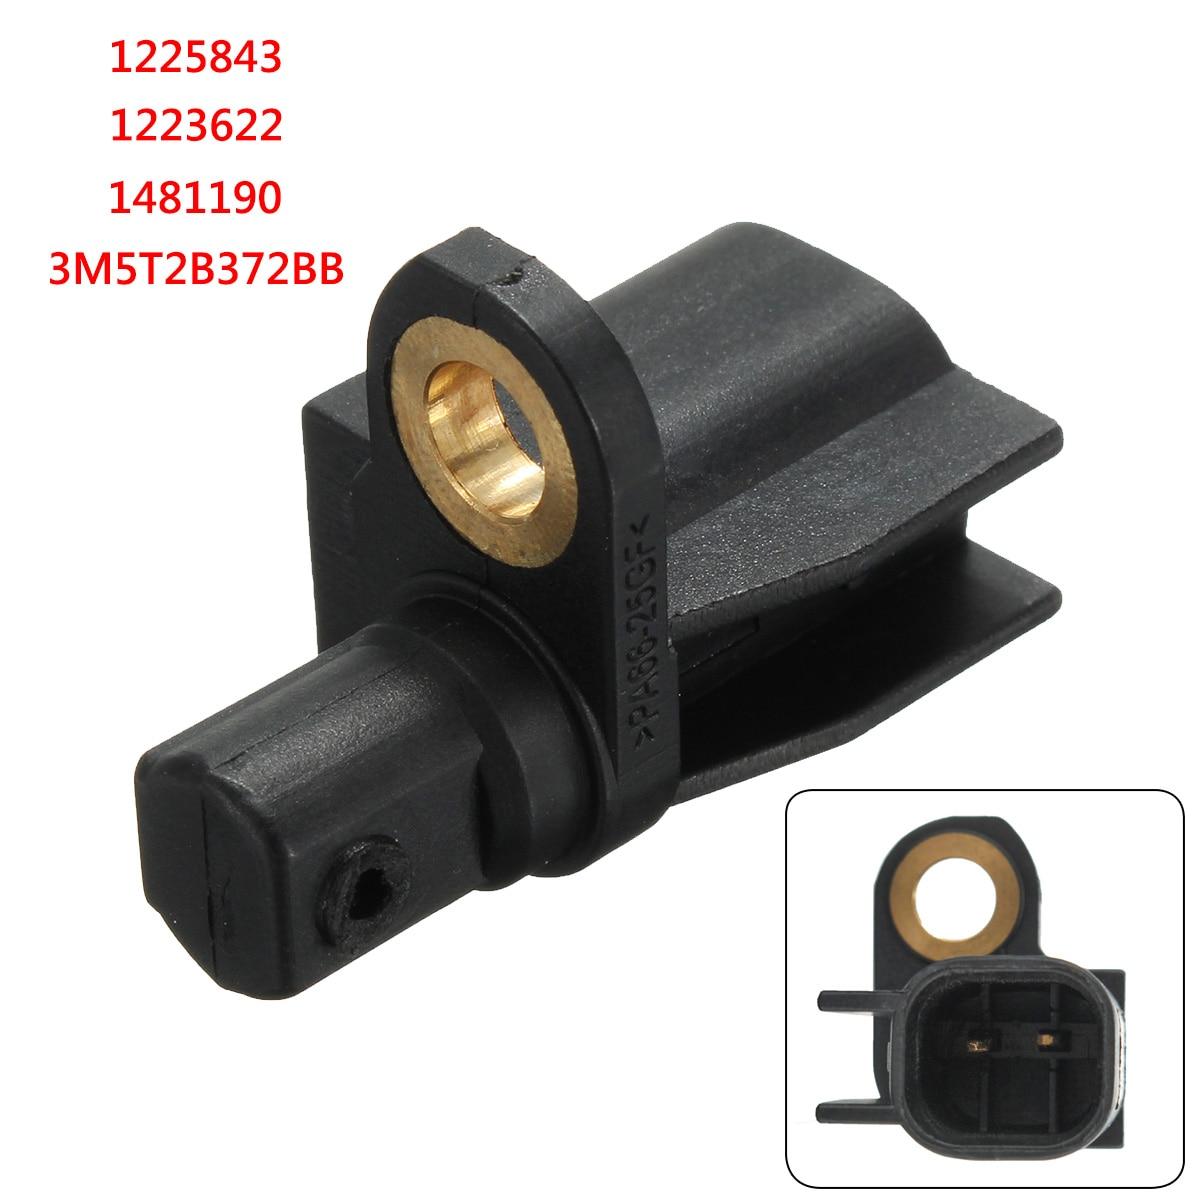 ABS Sensor Rear For Ford -Focus -Mondeo -C-Max -Galaxy -Mazda 3 1225843 1223622